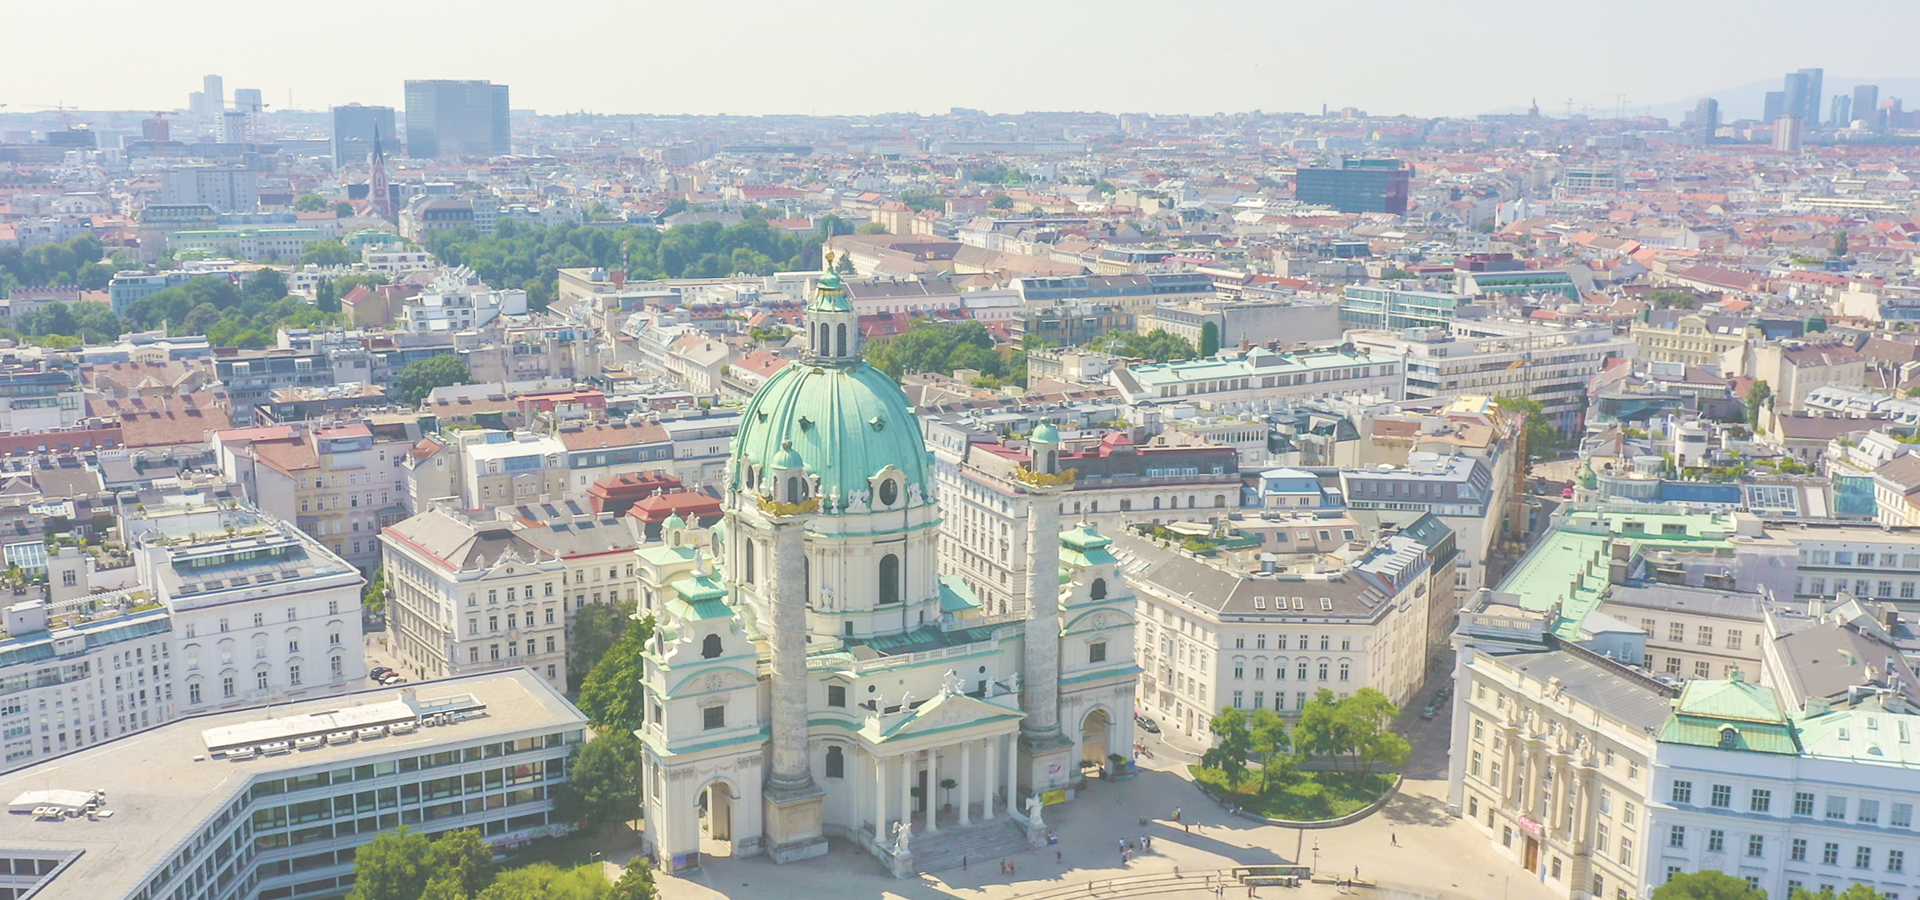 Peer-to-peer advisory in Vienna, Austria